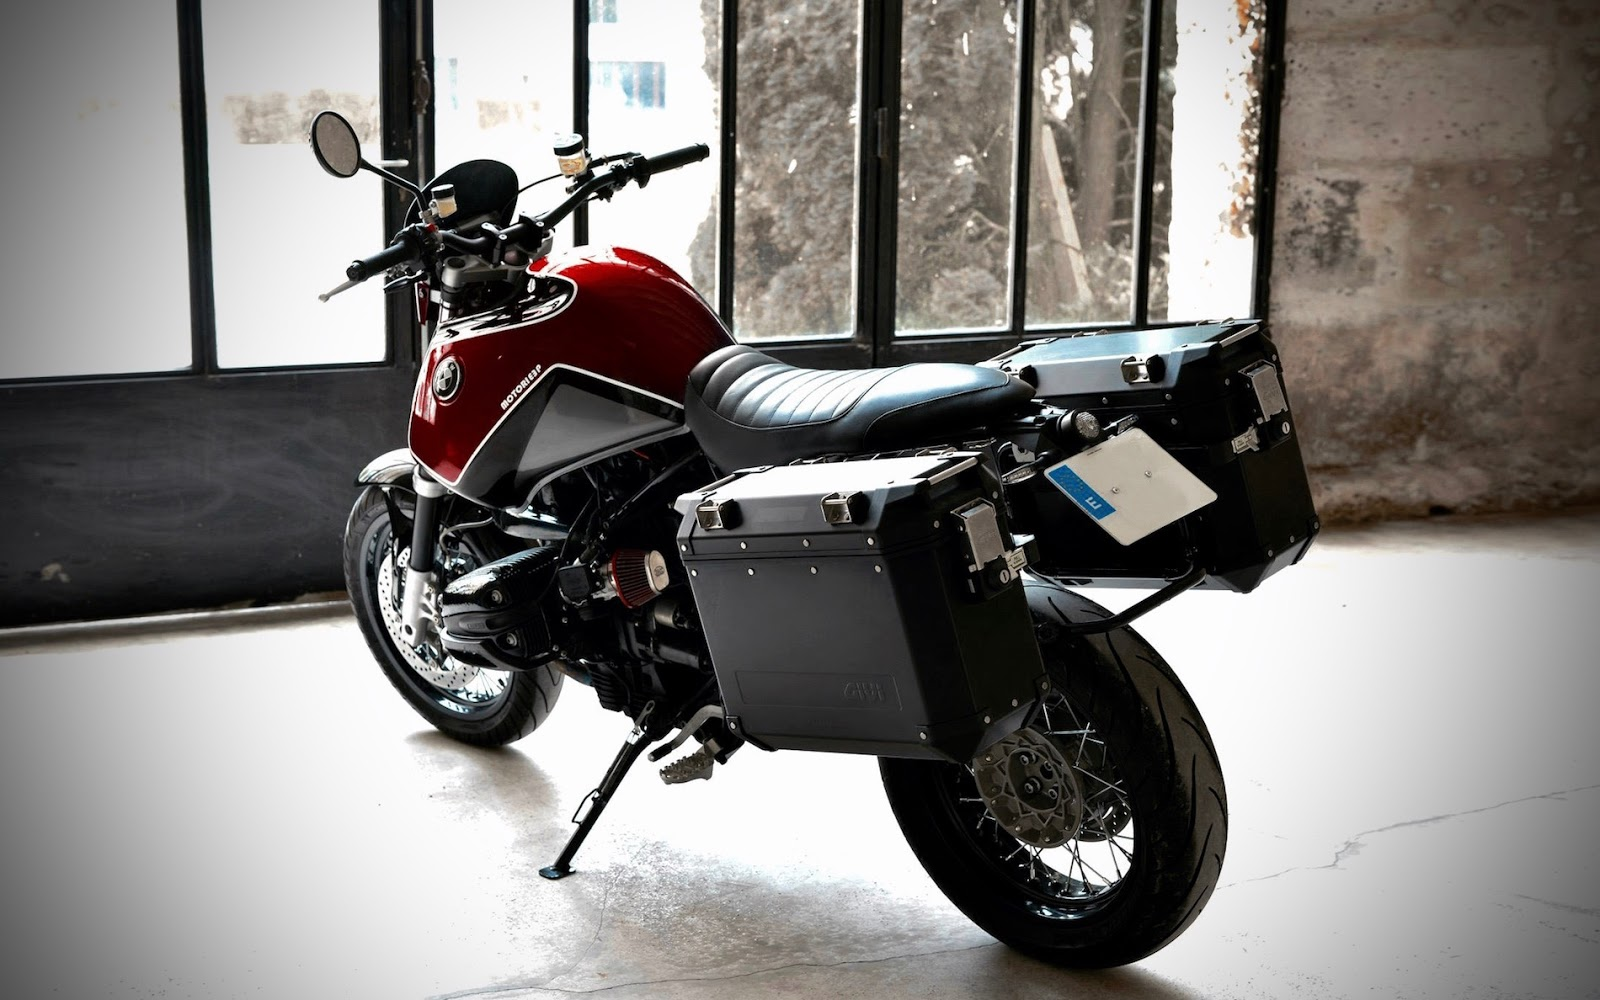 1150 Gs Custom Move Ten Manual Shift Motorcycle Suzuki 2001 Smt By Motorieep